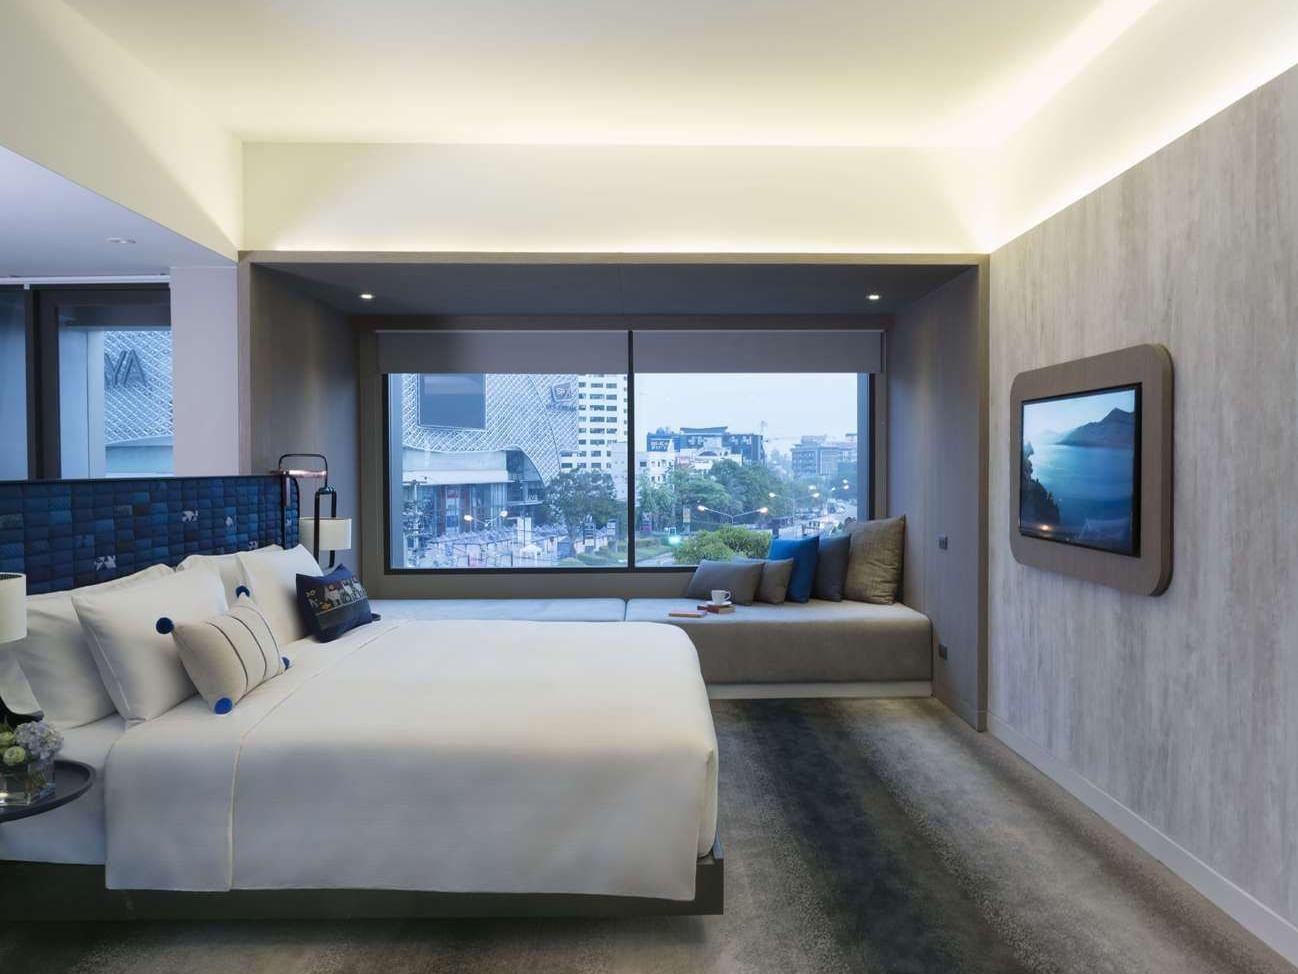 Premium Deluxe Corner room at U Hotels and Resorts